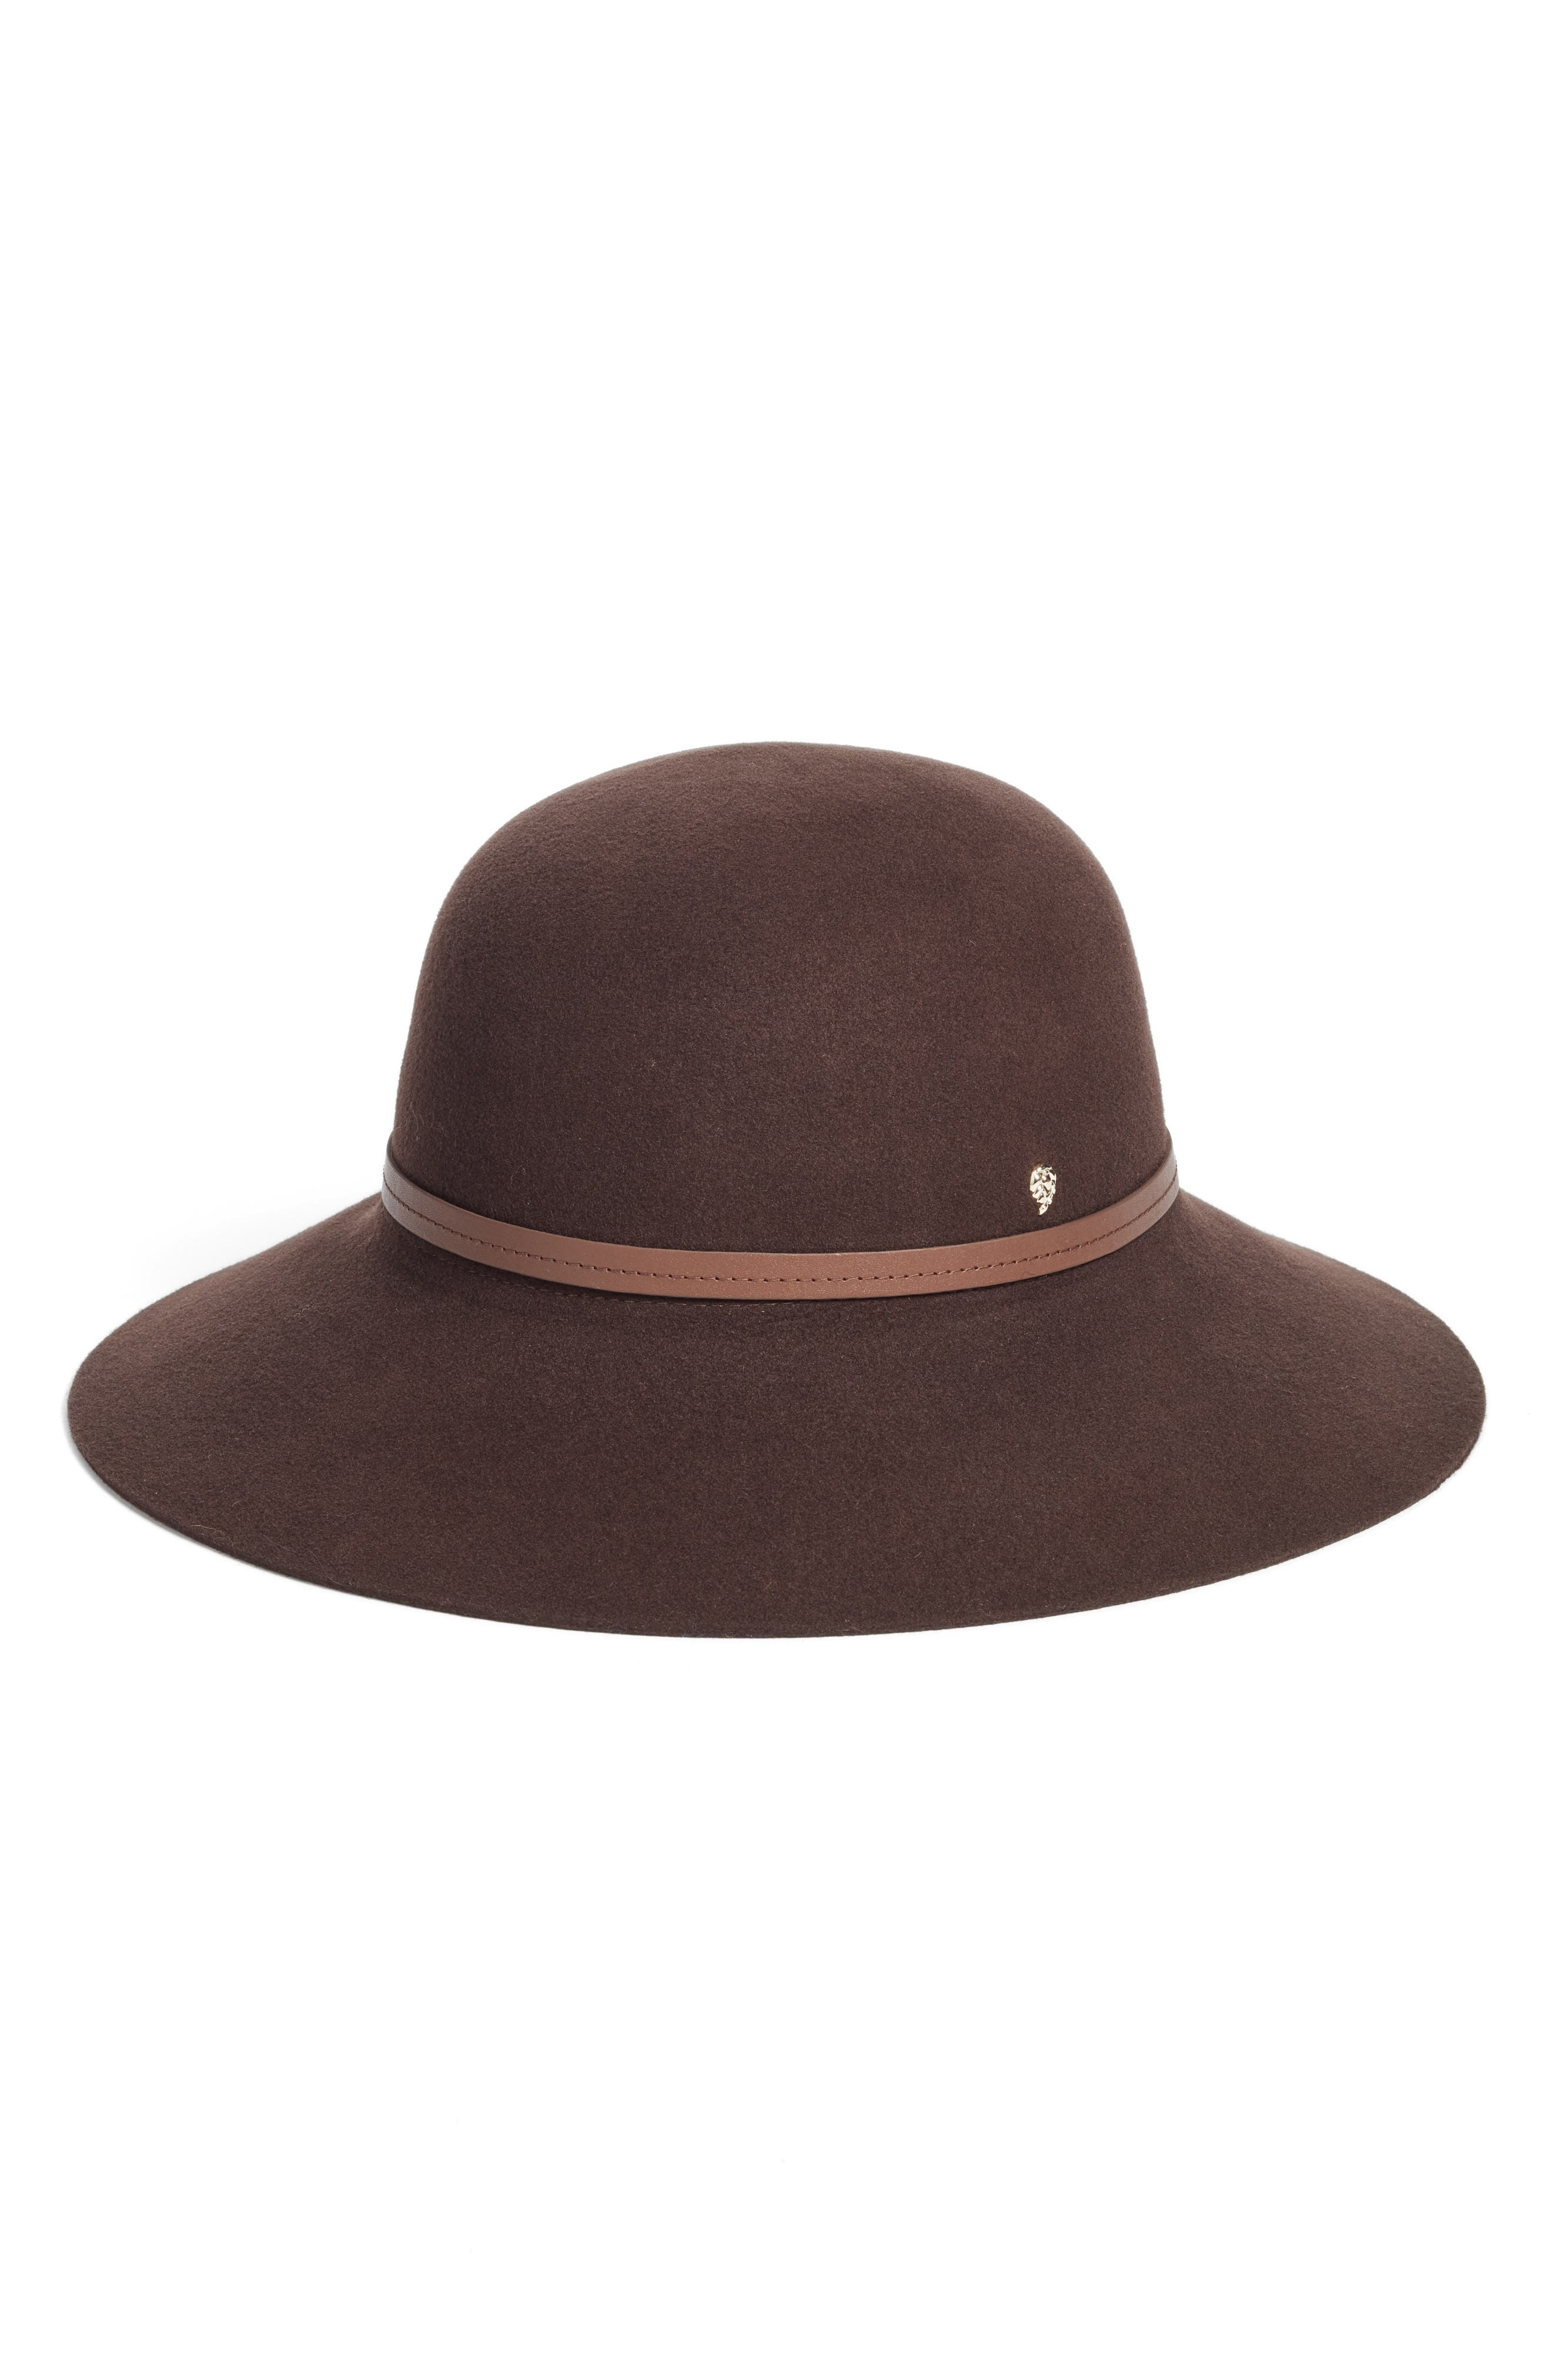 Angled Brim Wool Felt Hat,                             Main thumbnail 1, color,                             200